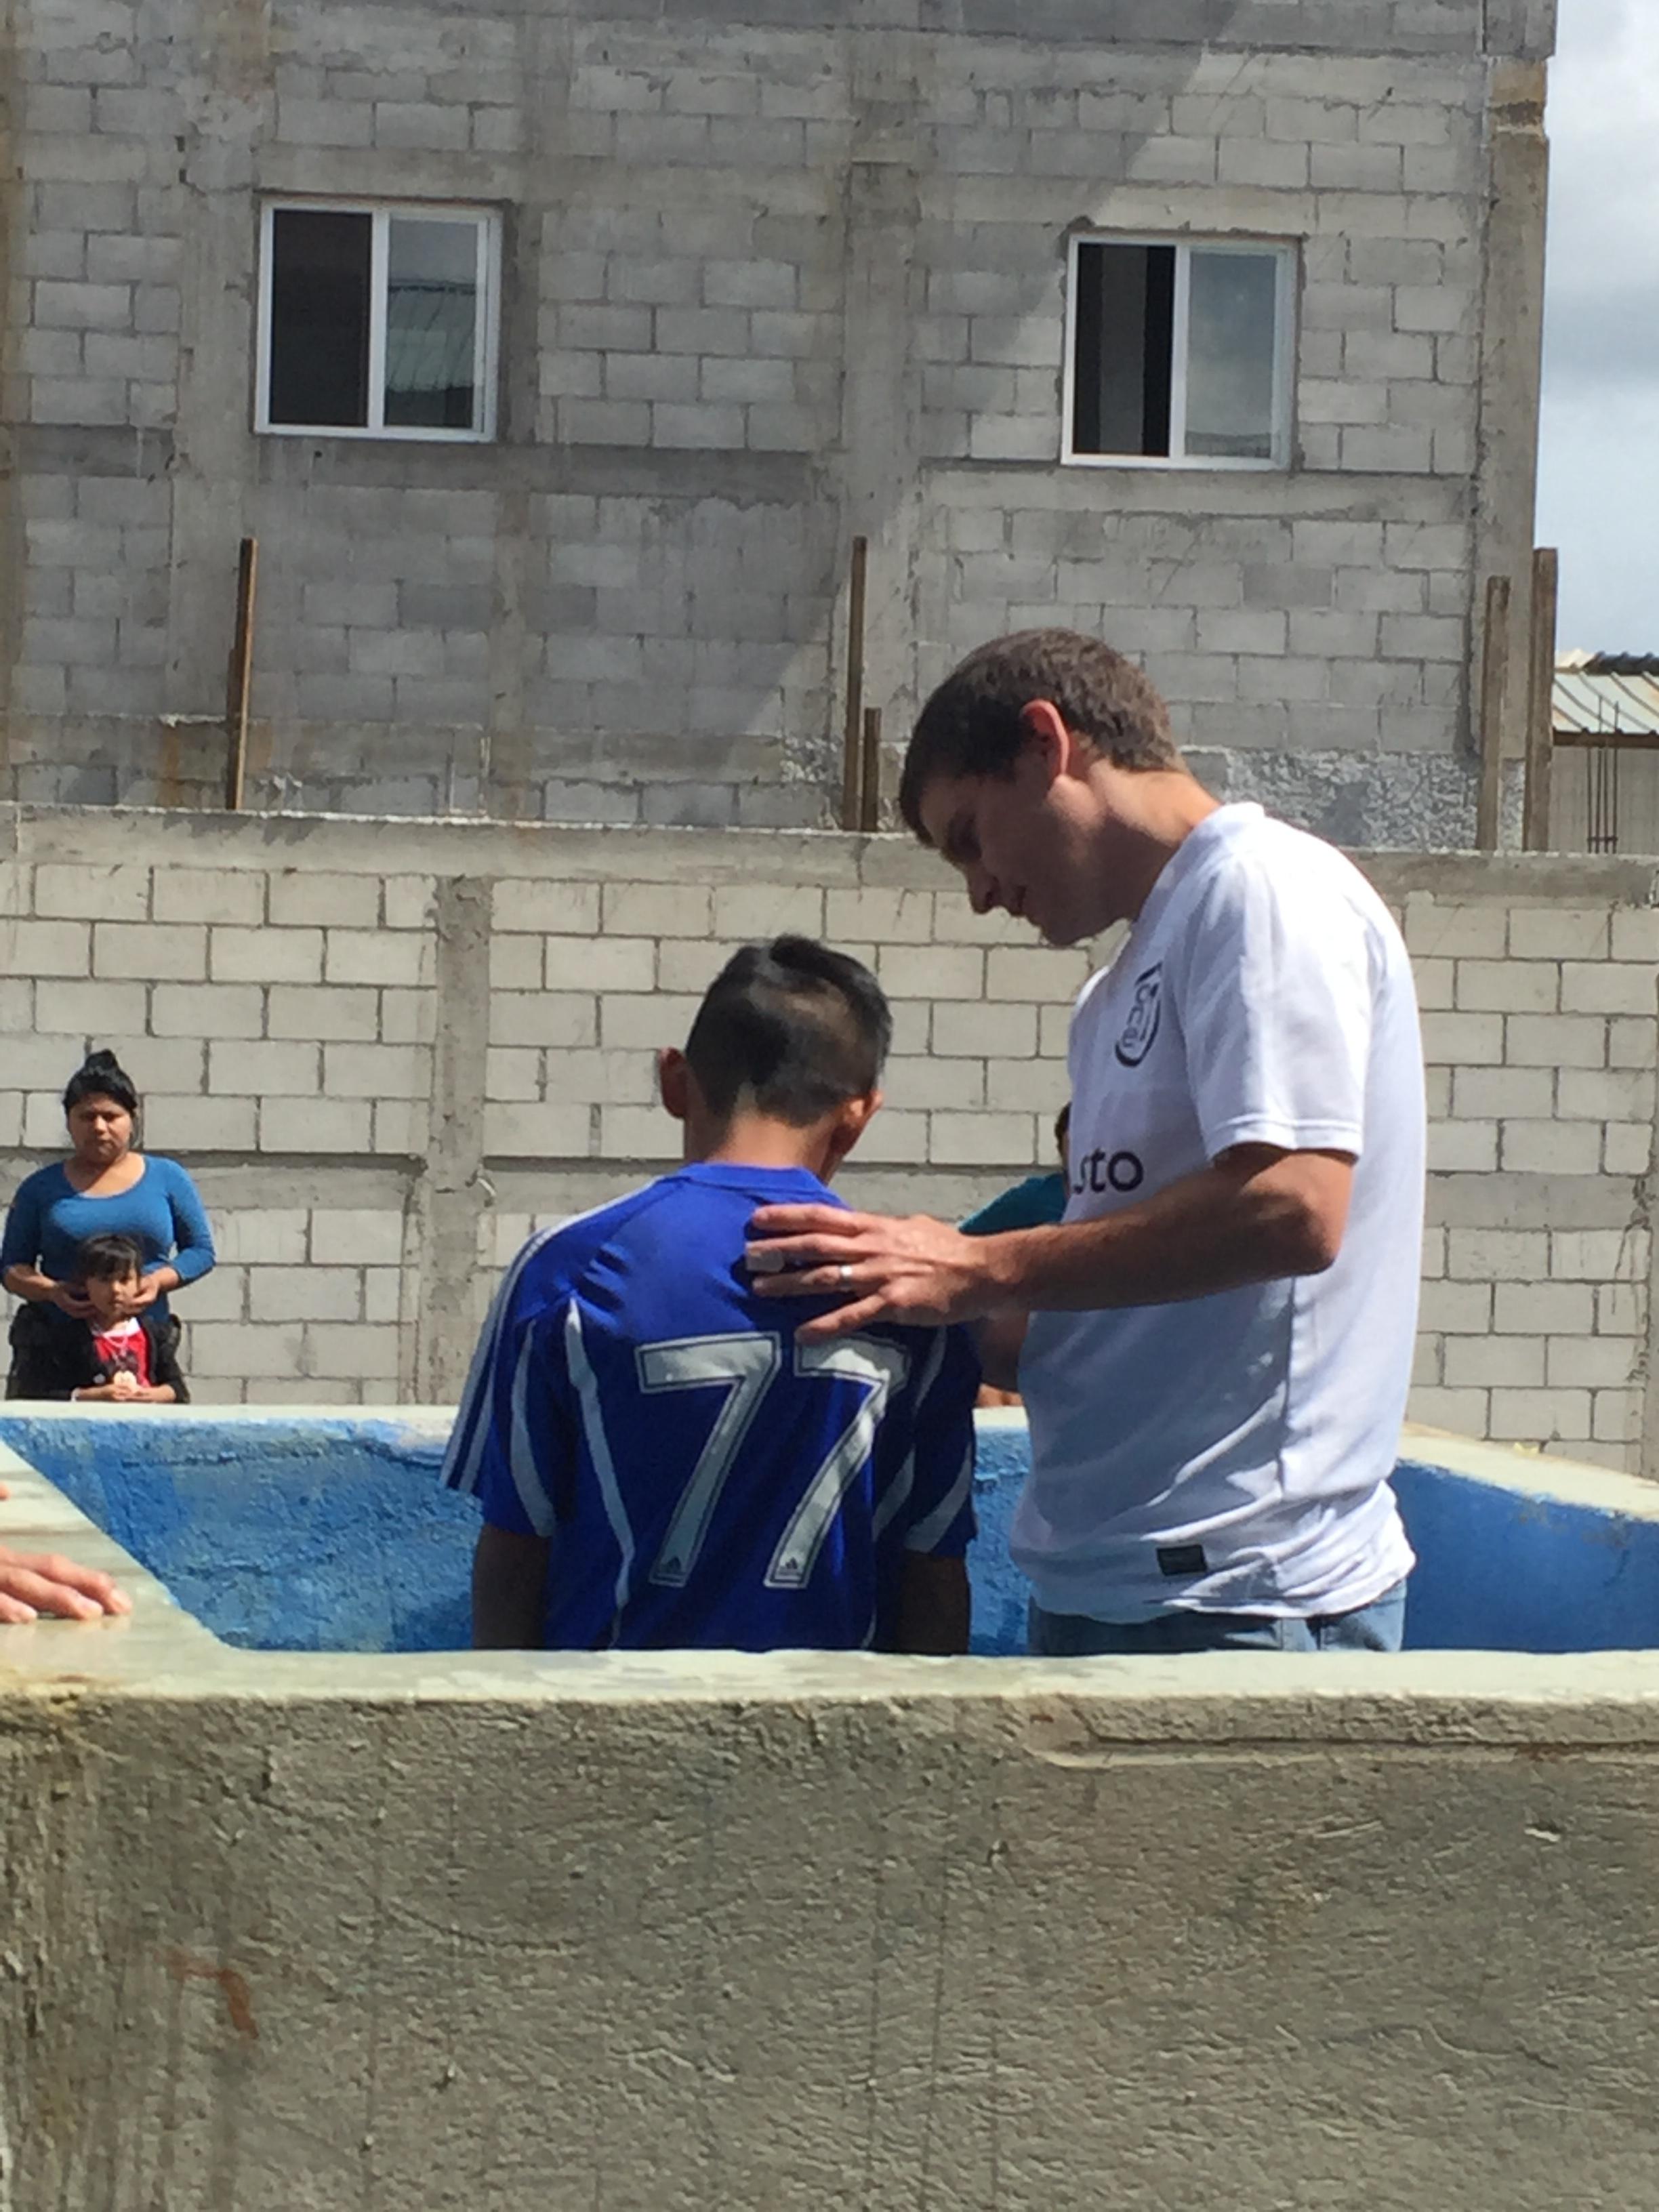 Adam baptizing one of the boys